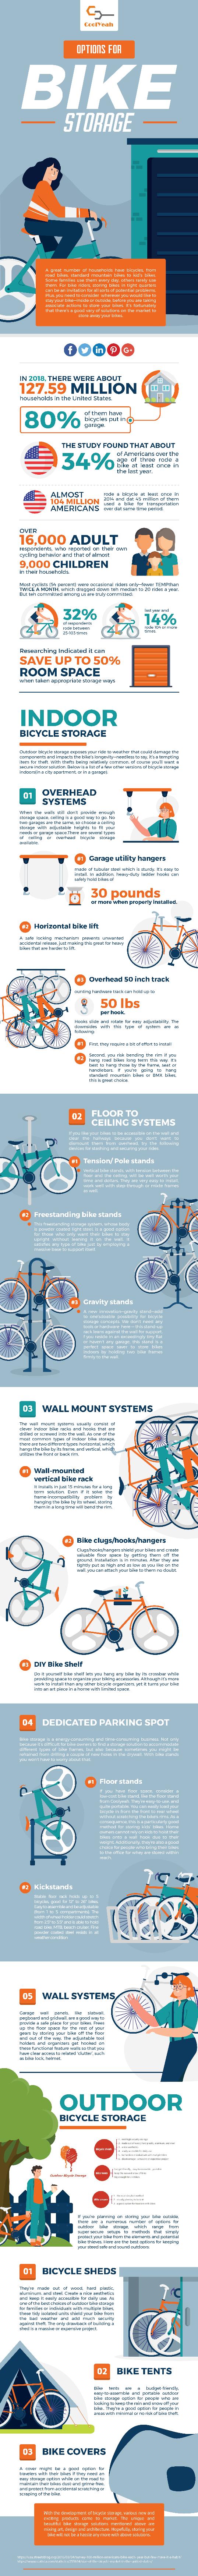 Bike-Storage-Options